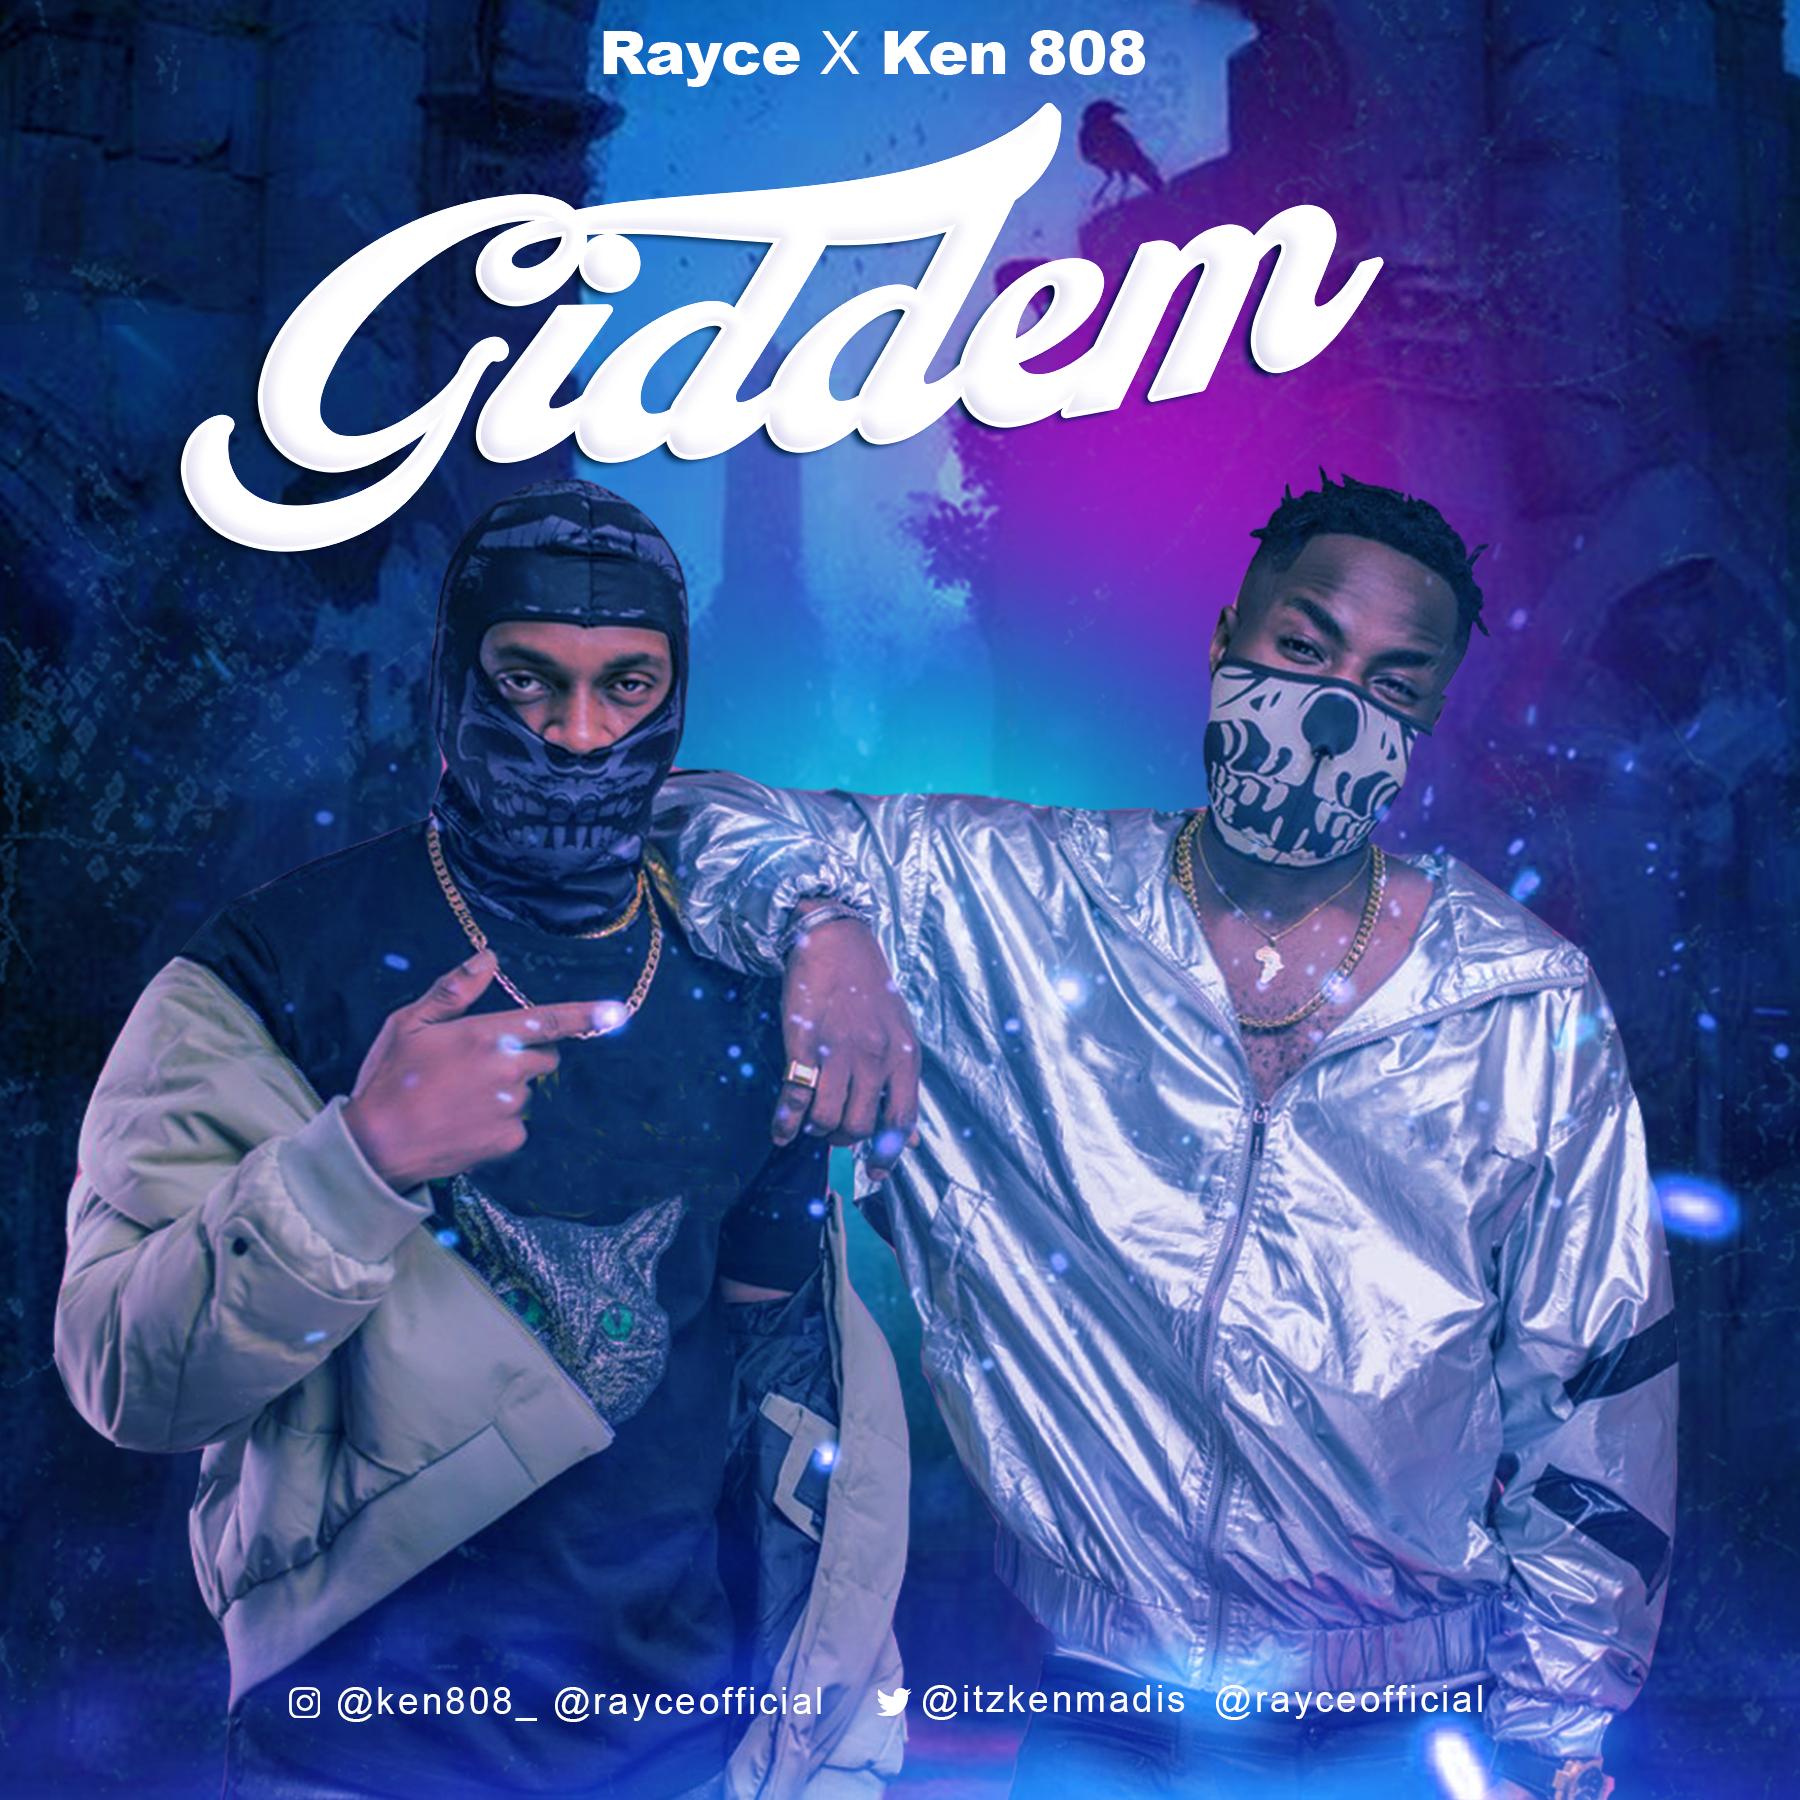 Rayce x Ken 808 - Giddem